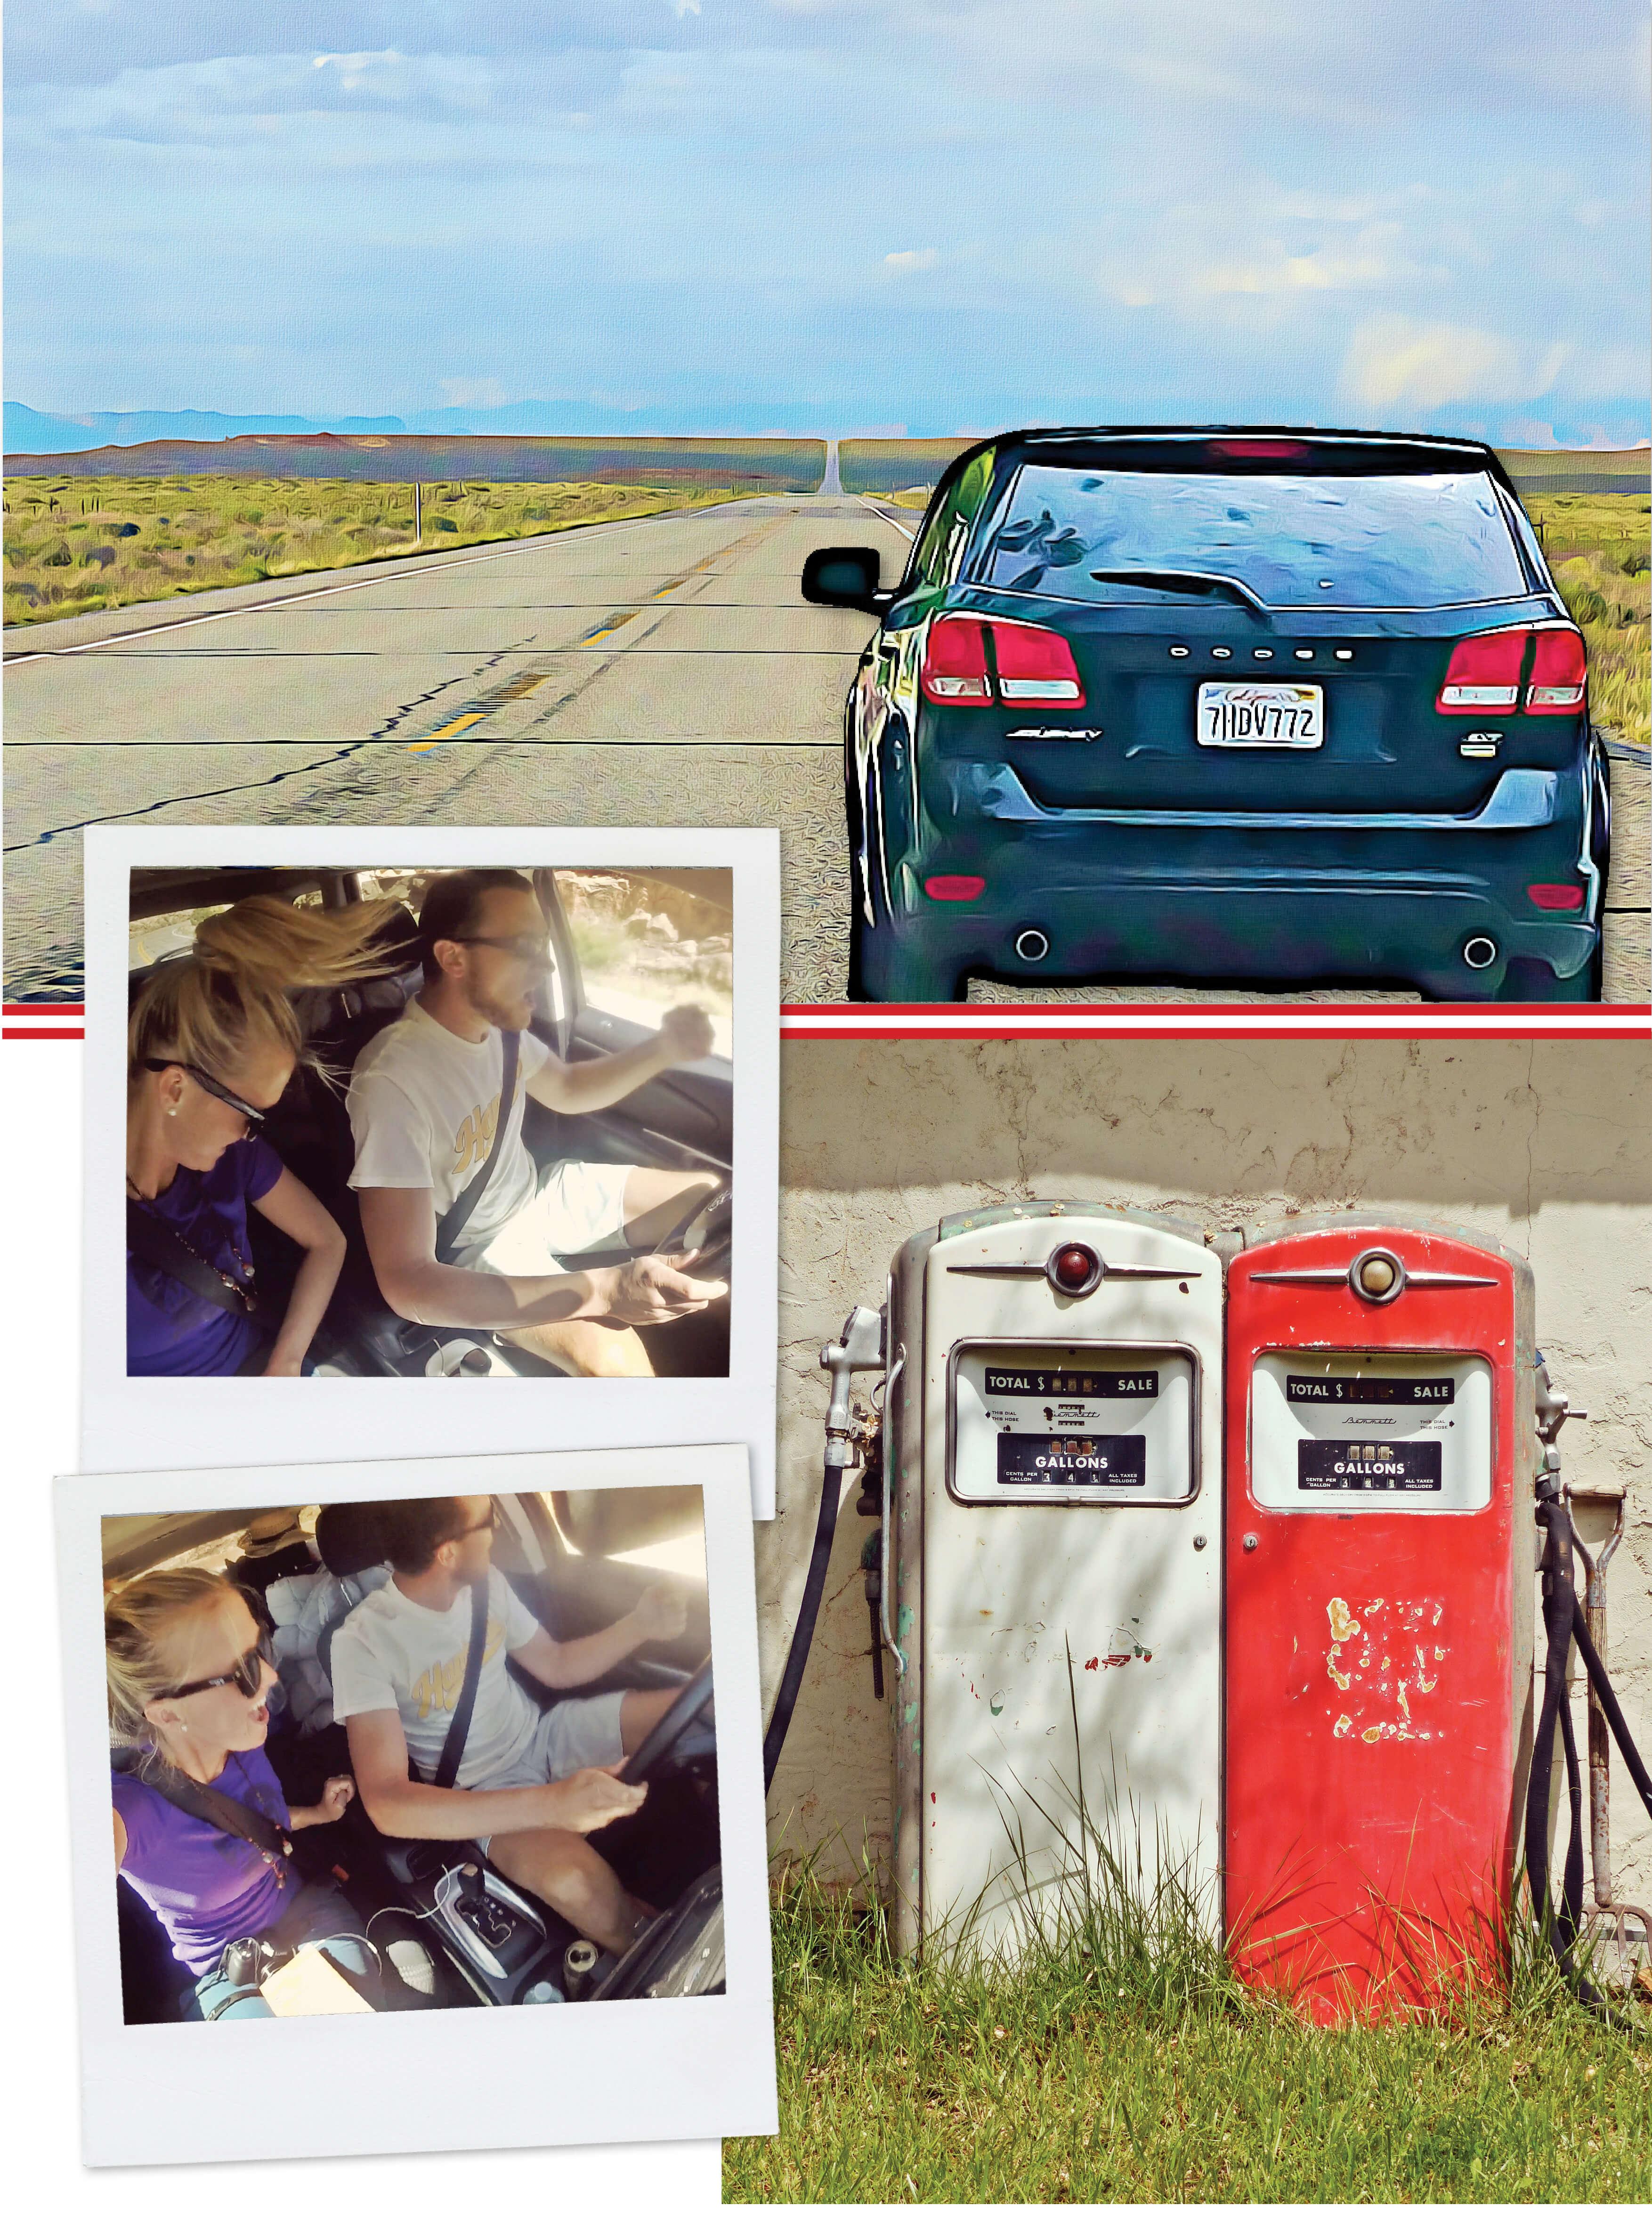 usa, utah, road trip, voiture, pompe a essence, voyage